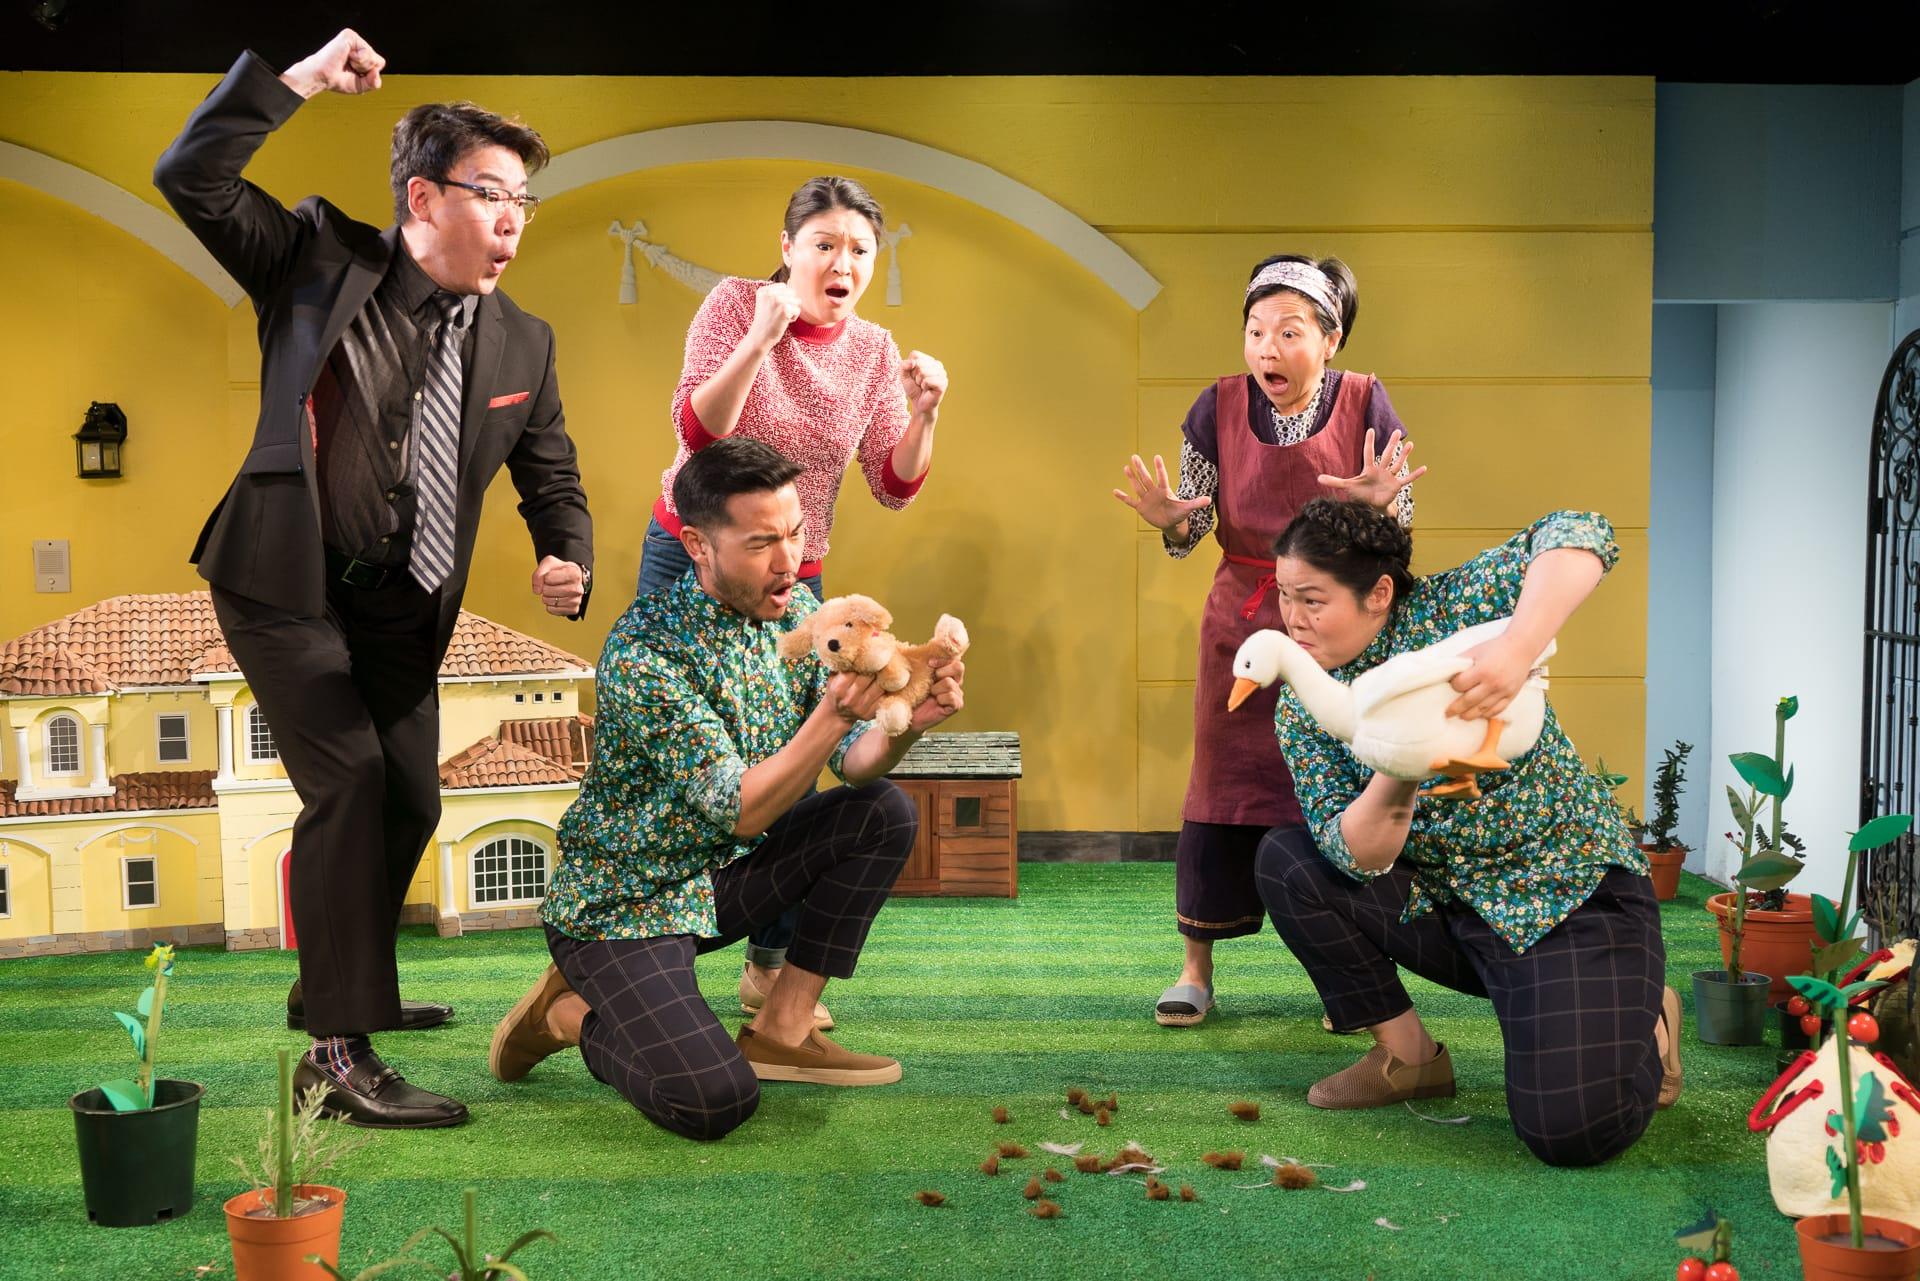 Kenneth Lee, Daniel K. Isaac, Jennifer Lim, Julyana Soelistyo, Holly Chou, dog, and goose (Photo: Elke Young)